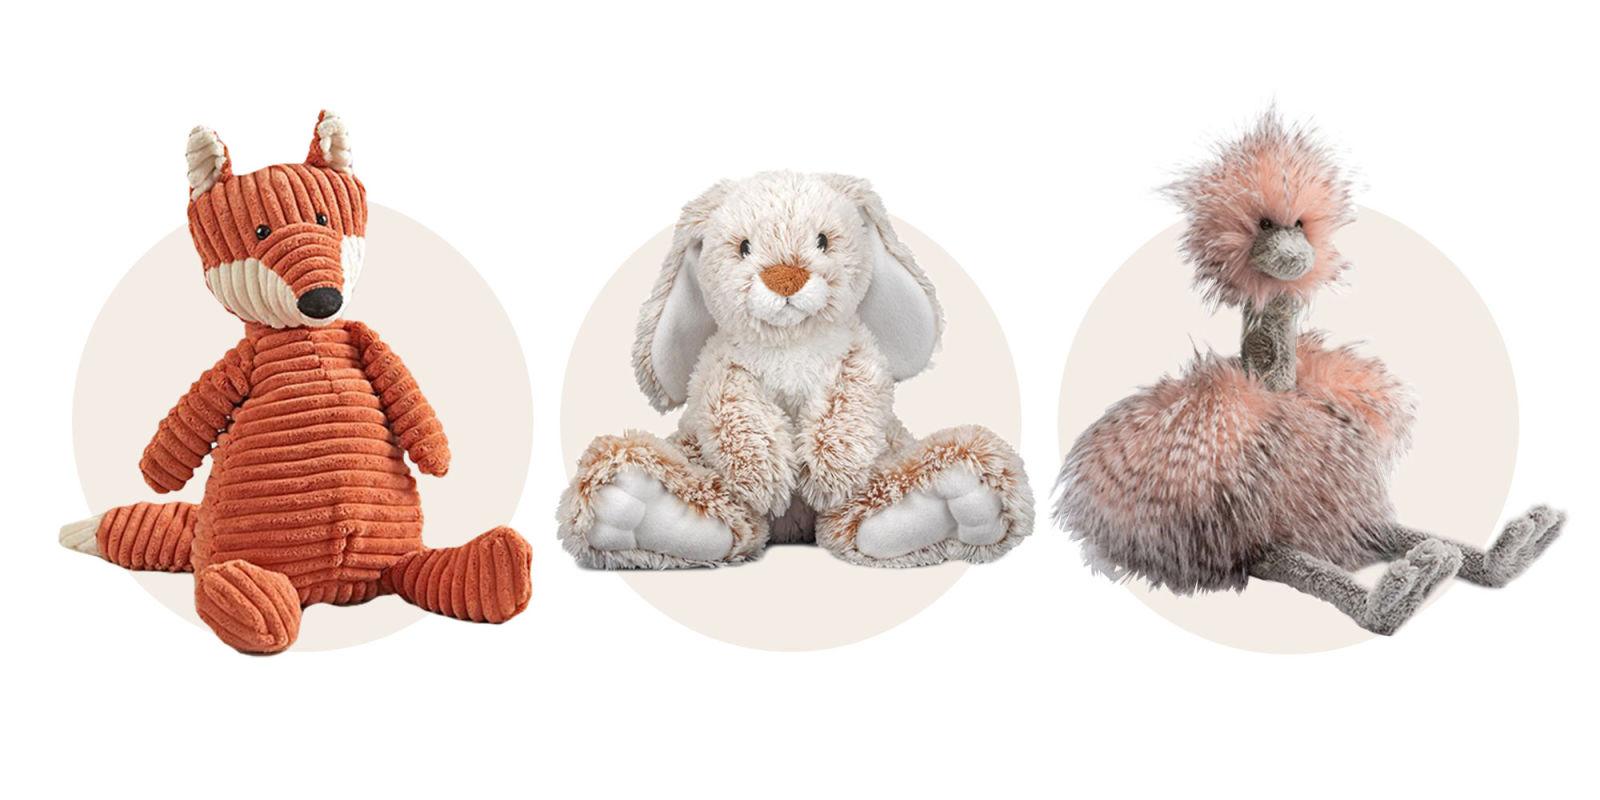 15 best stuffed animals for valentine u0027s day in 2017 kids plush